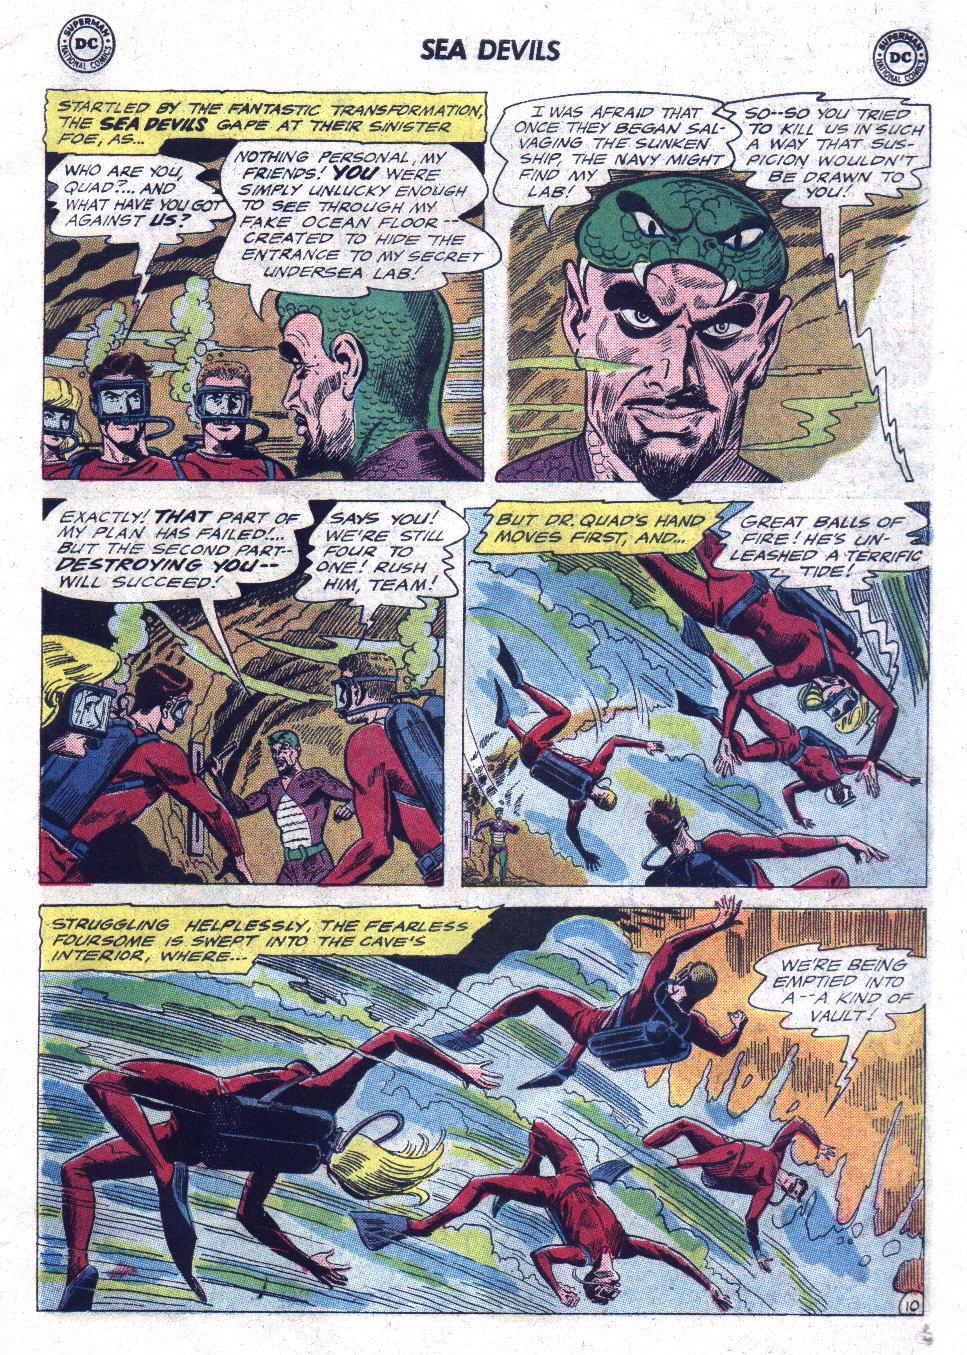 Read online Sea Devils comic -  Issue #21 - 15